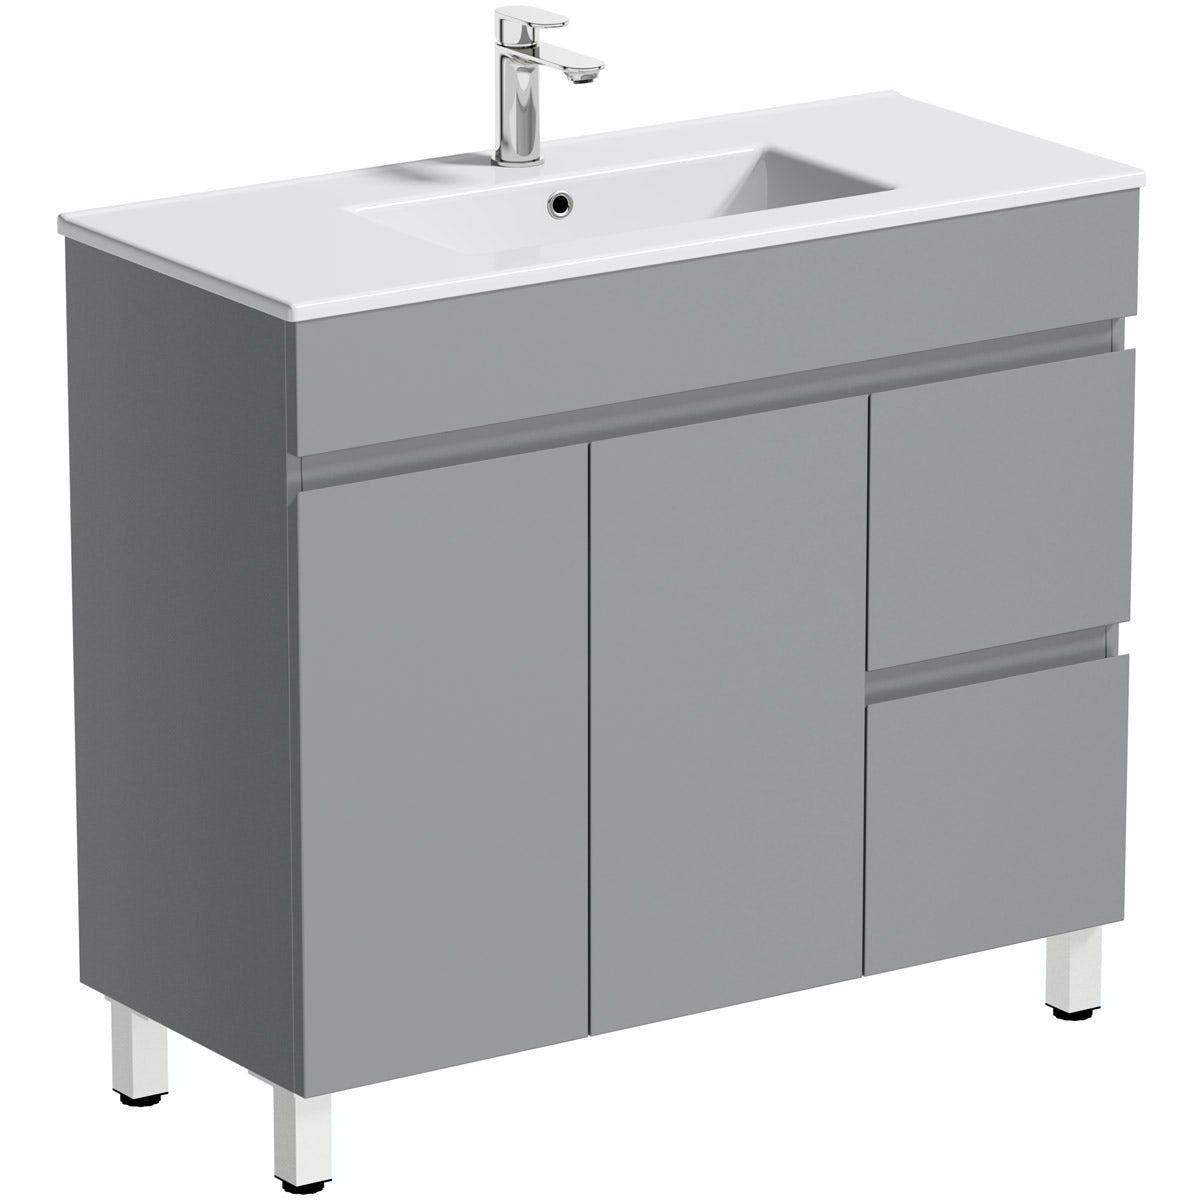 7 Bathroom Ideas Vanity Units Basin Bathroom Vanity Units